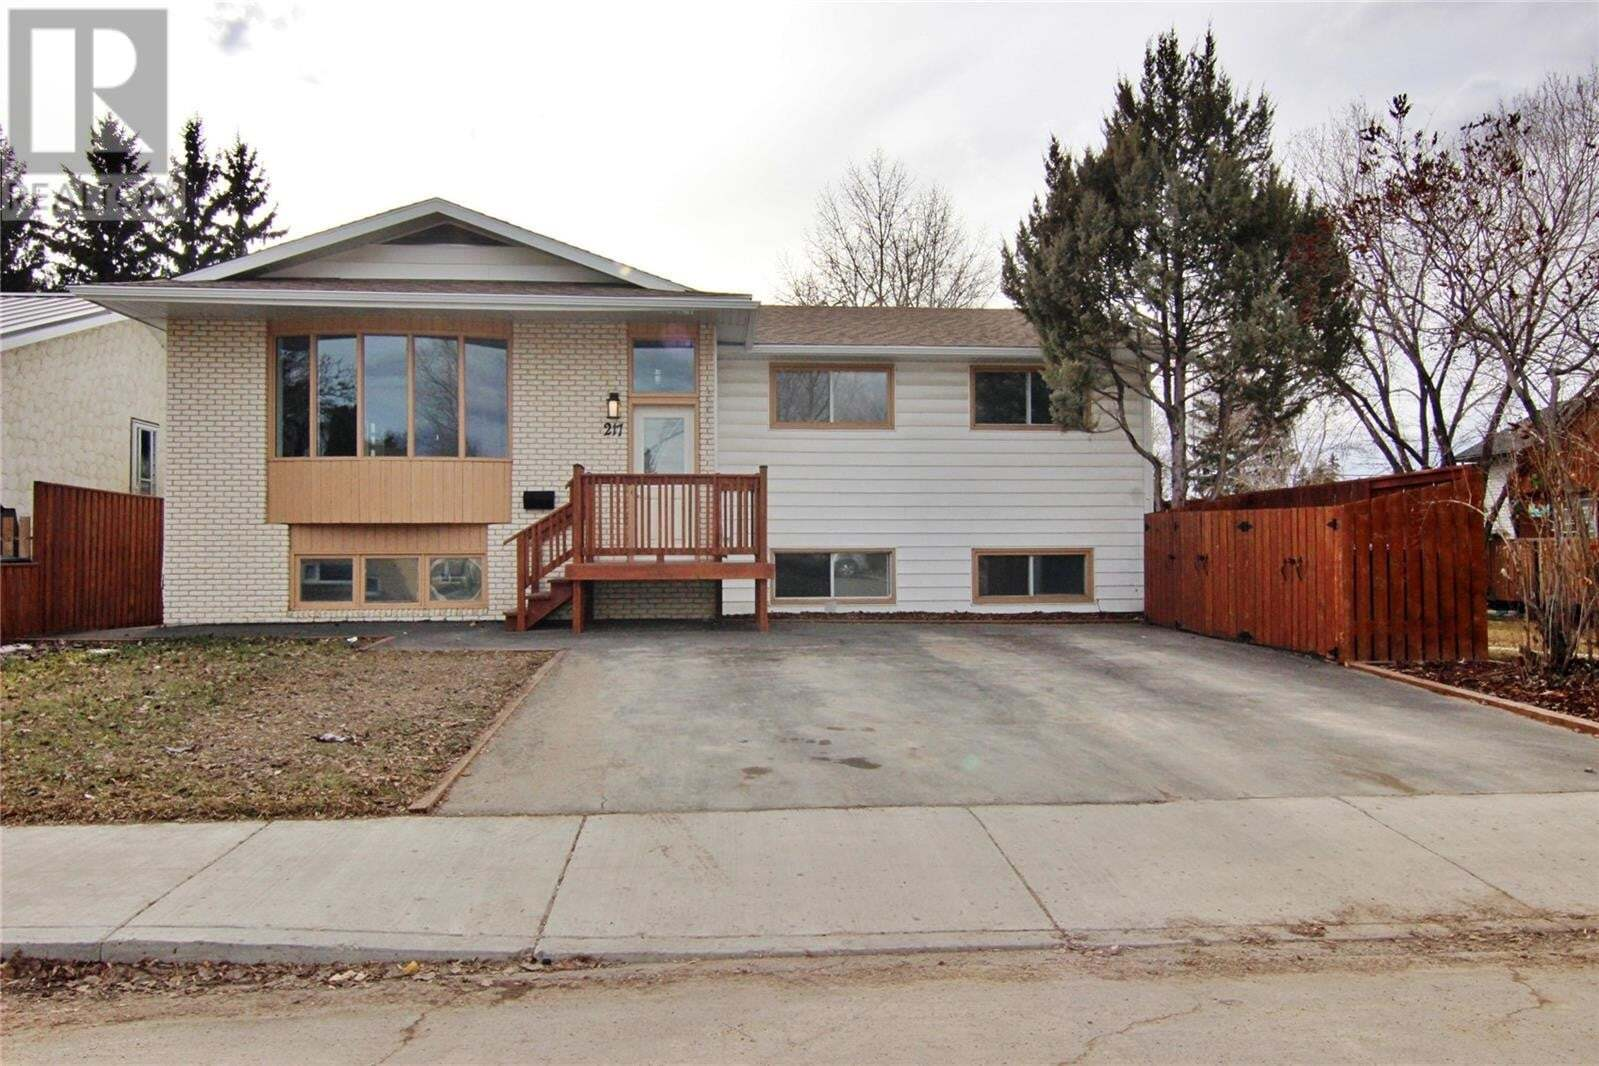 House for sale at 217 S Ave N Saskatoon Saskatchewan - MLS: SK825815